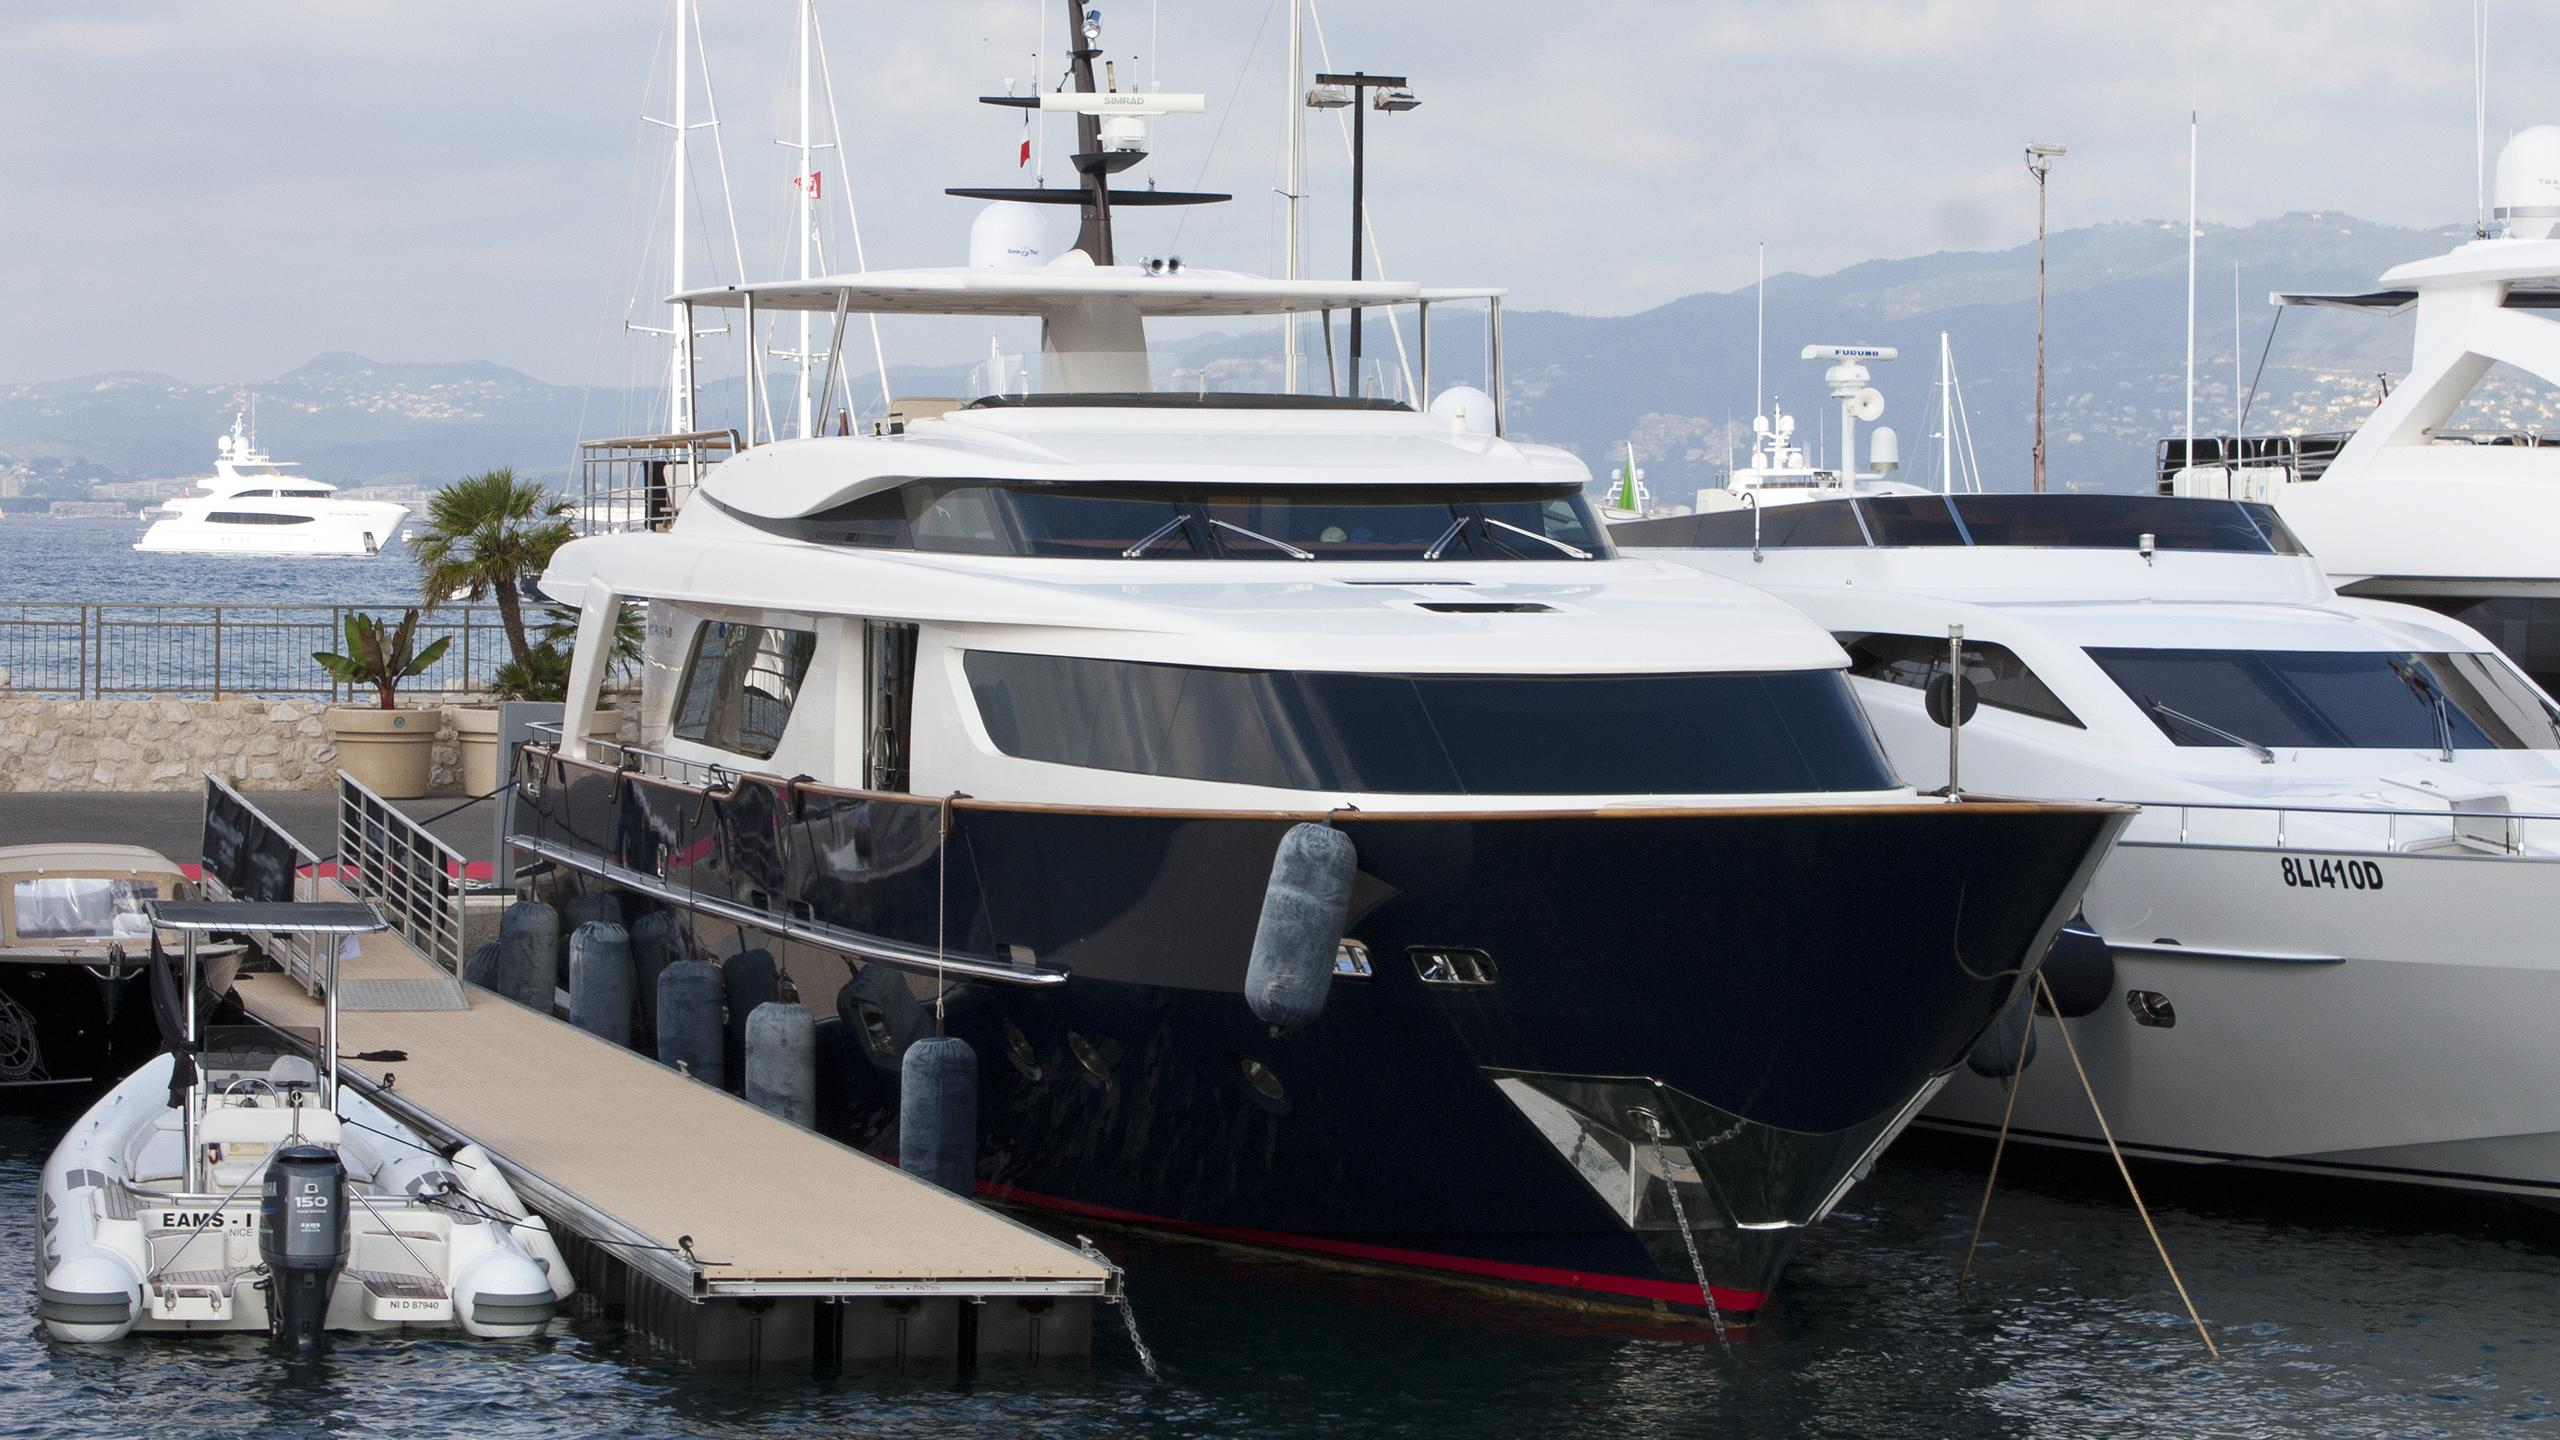 aquila-motor-yacht-san-lorenzo-2008-28m-bow